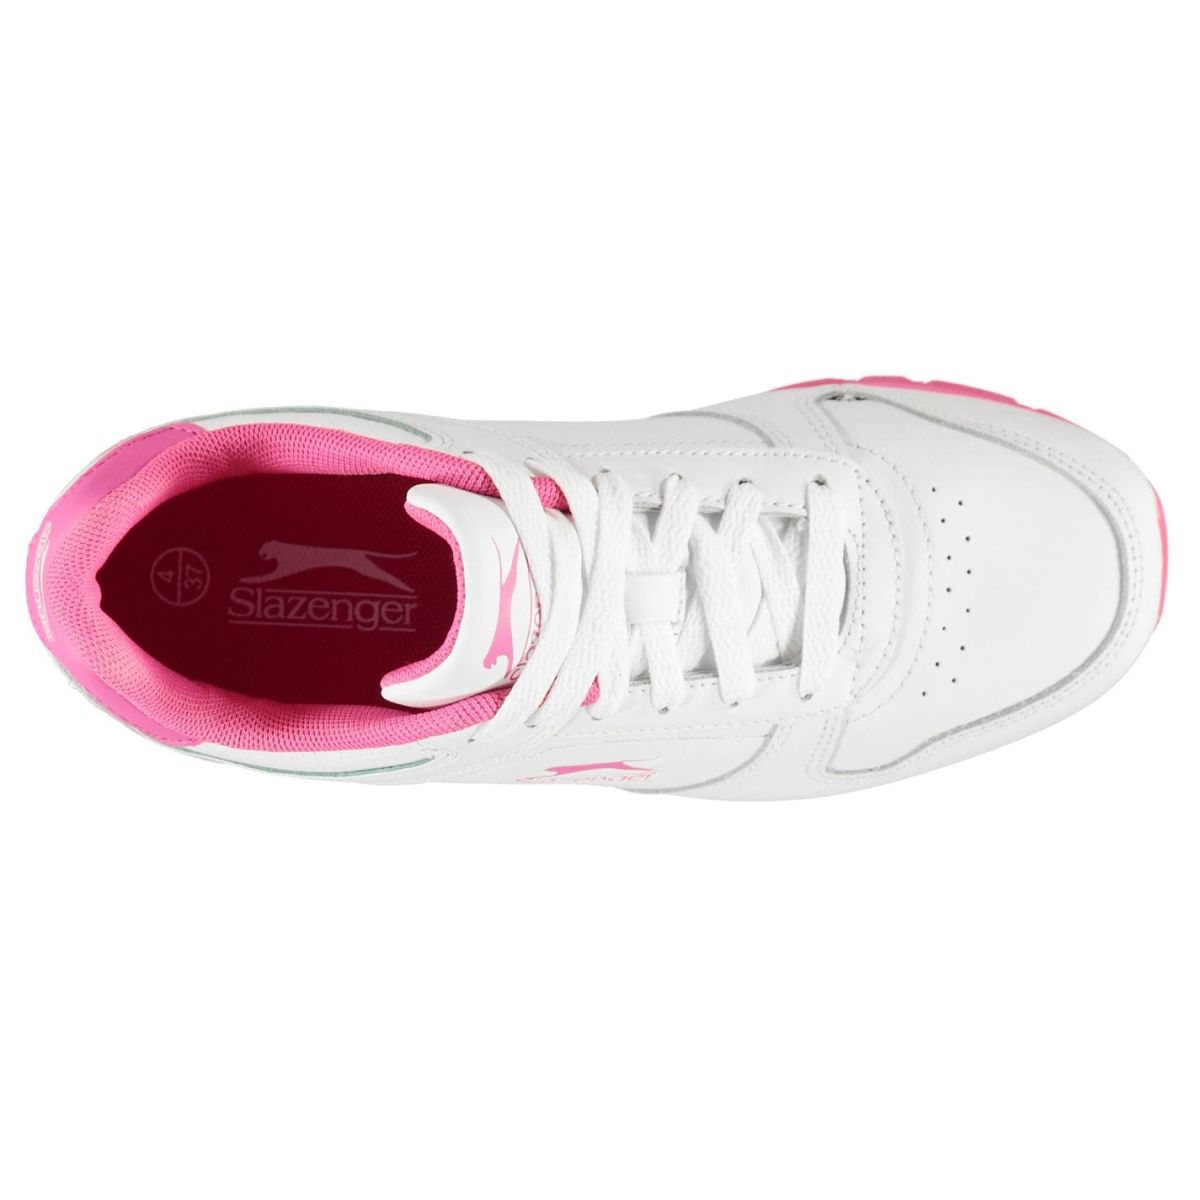 Slazenger-Classic-Turnschuhe-Laufschuhe-Damen-Sportschuhe-Sneaker-1265 Indexbild 16